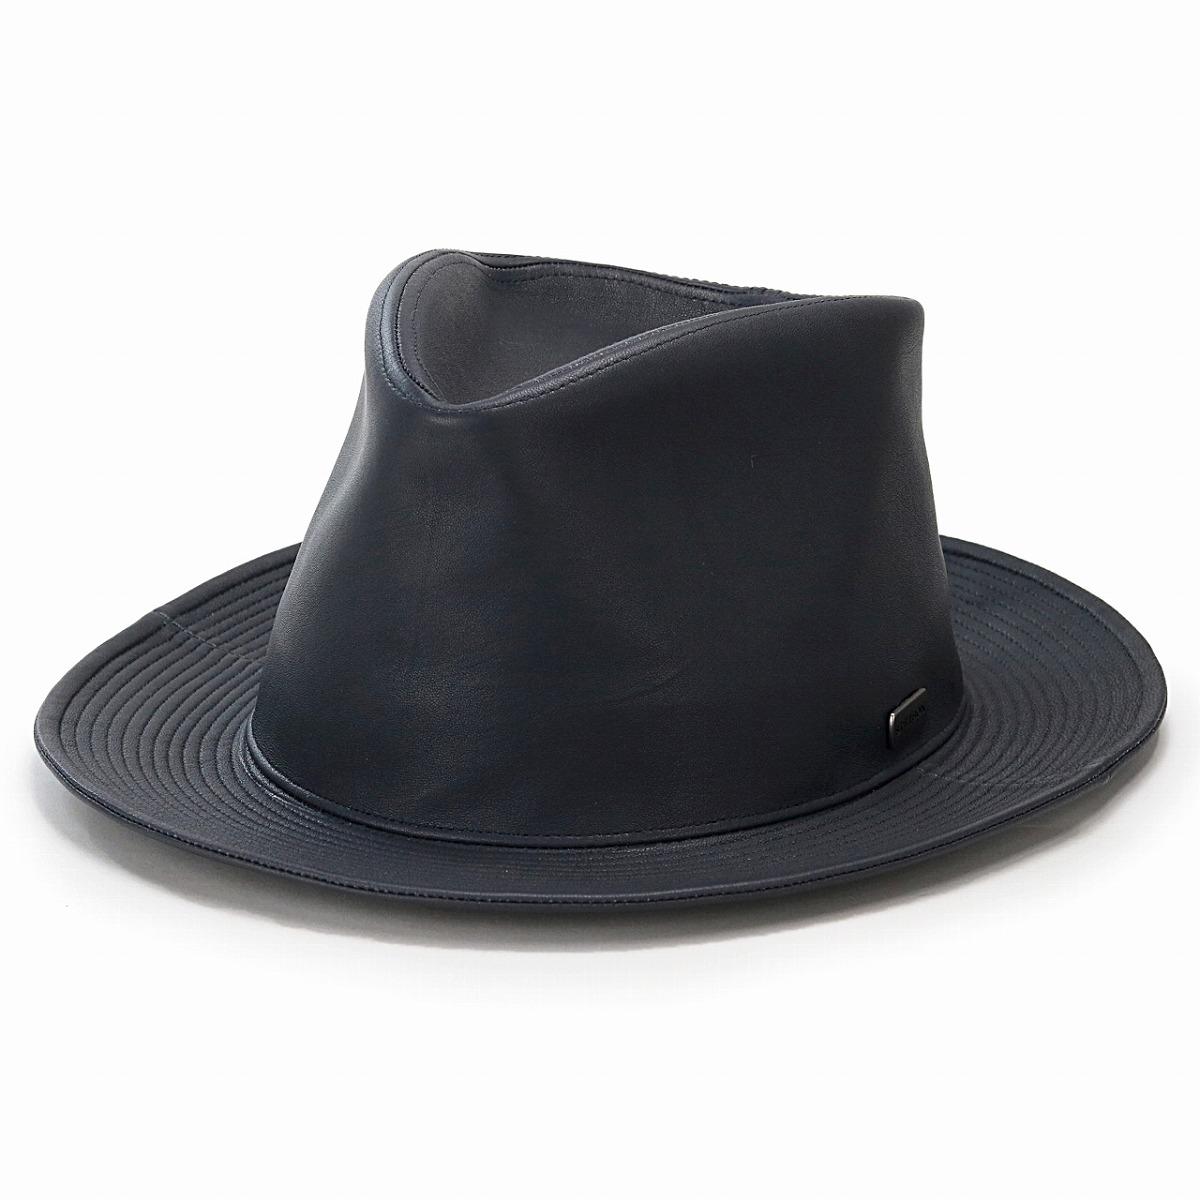 58cm 60cm STETSON gentleman soft felt hat Shin pull gray black black   fedora  stetson ... 854a53486cf